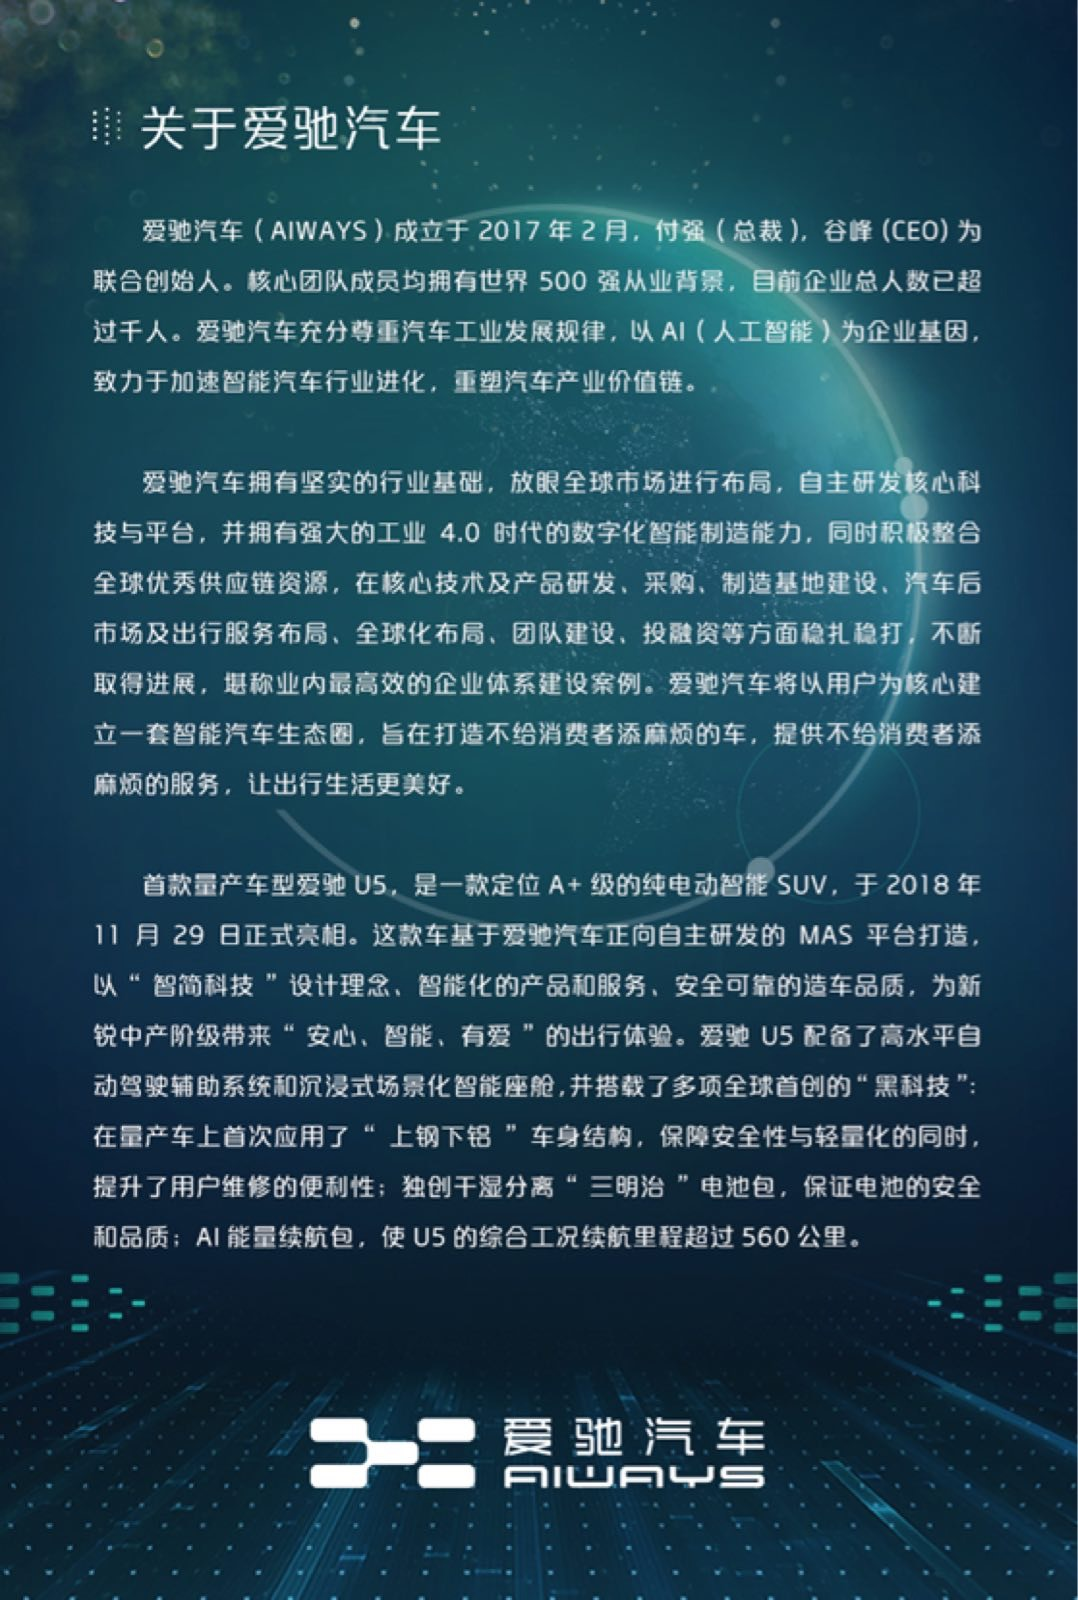 C:\Users\HZYANG~1\AppData\Local\Temp\WeChat Files\7f19eebe708c95313c283f92dac8b5d.jpg